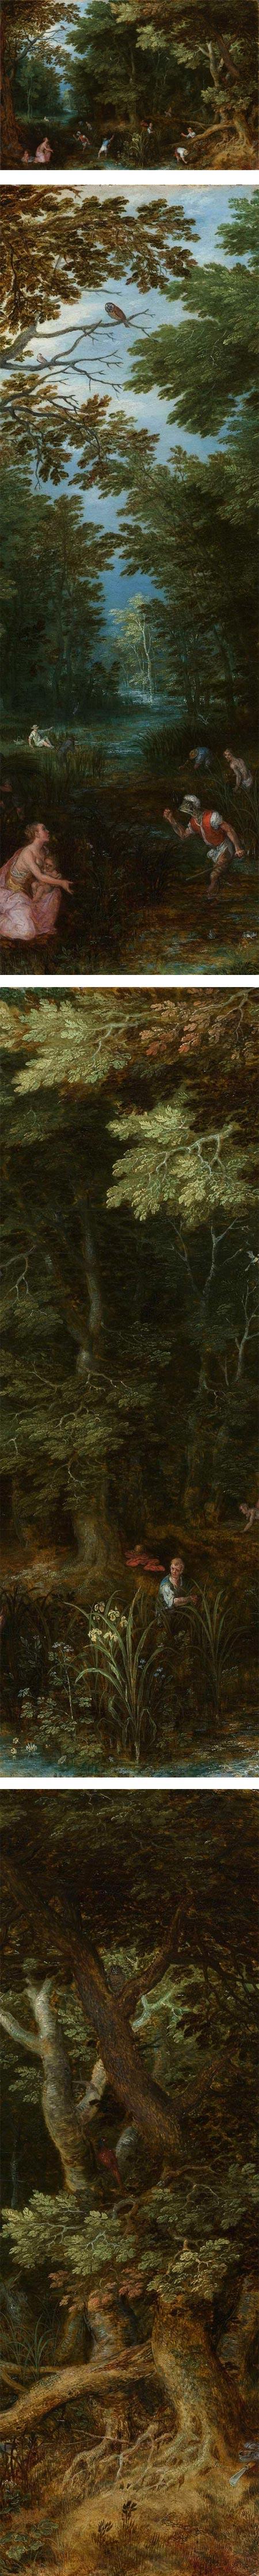 Latona and the Lycian Peasants, Jan Brueghel the Elder